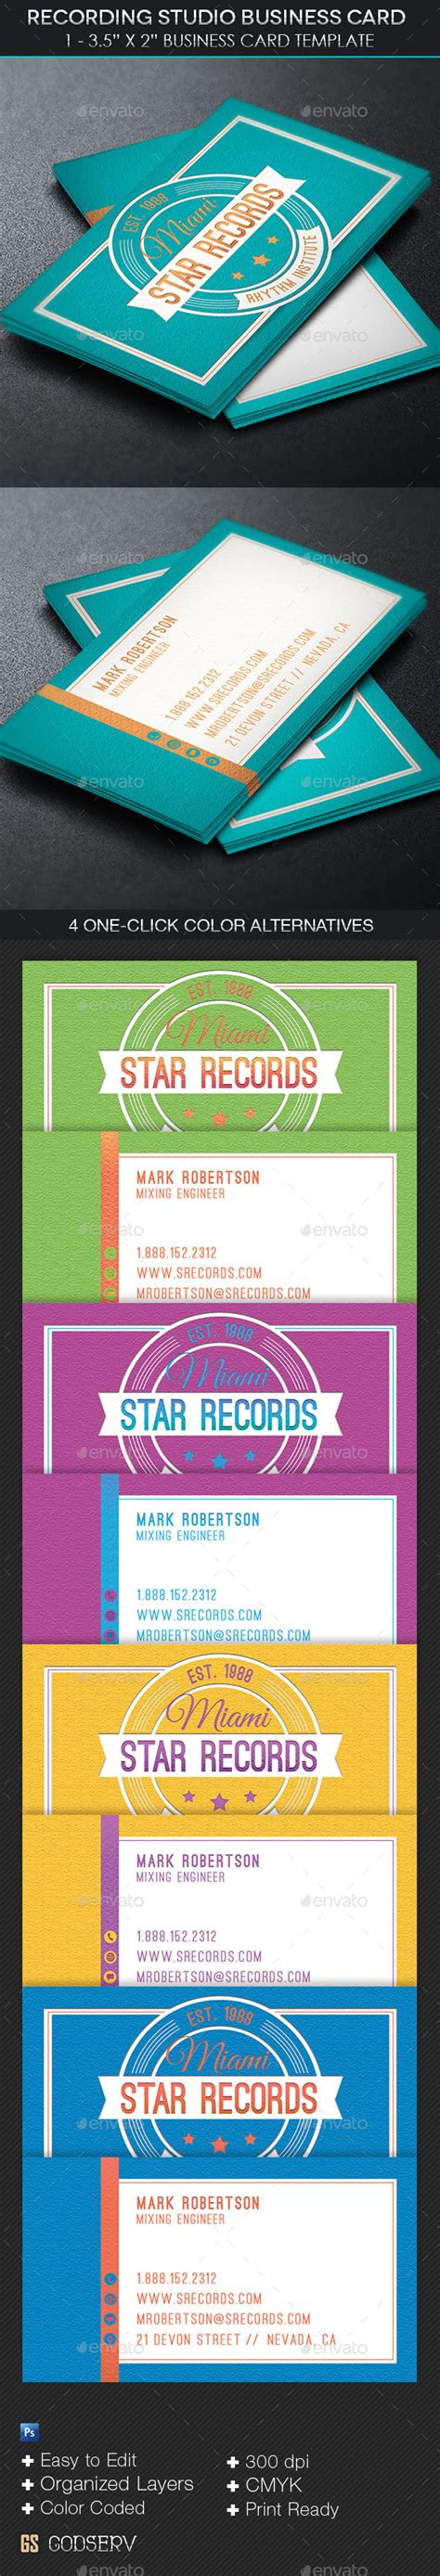 recording studio business card templates recording studio flyer psd 187 dondrup